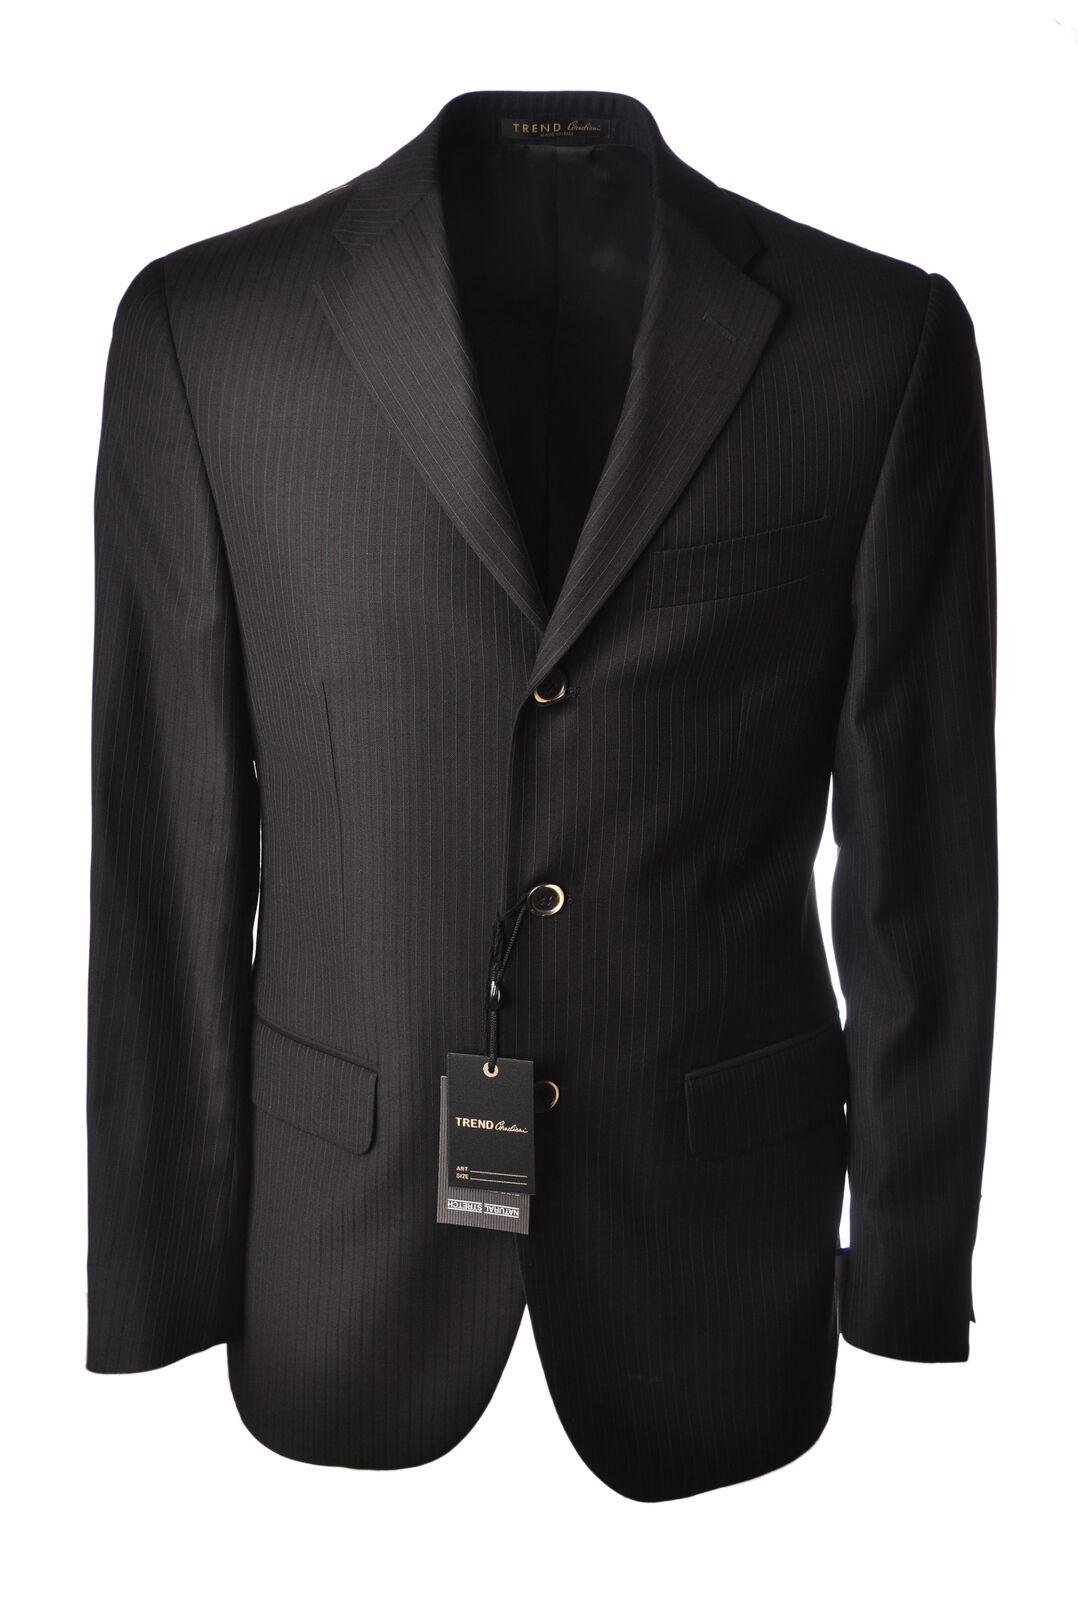 34bc9f84e Corneliani Trend - Länge - Männchen - Fantasie - 4713212A183425. Three  Piece Solid Navy Lazetti Couture Modern Fit 40R 34W Two Button Wool Suit